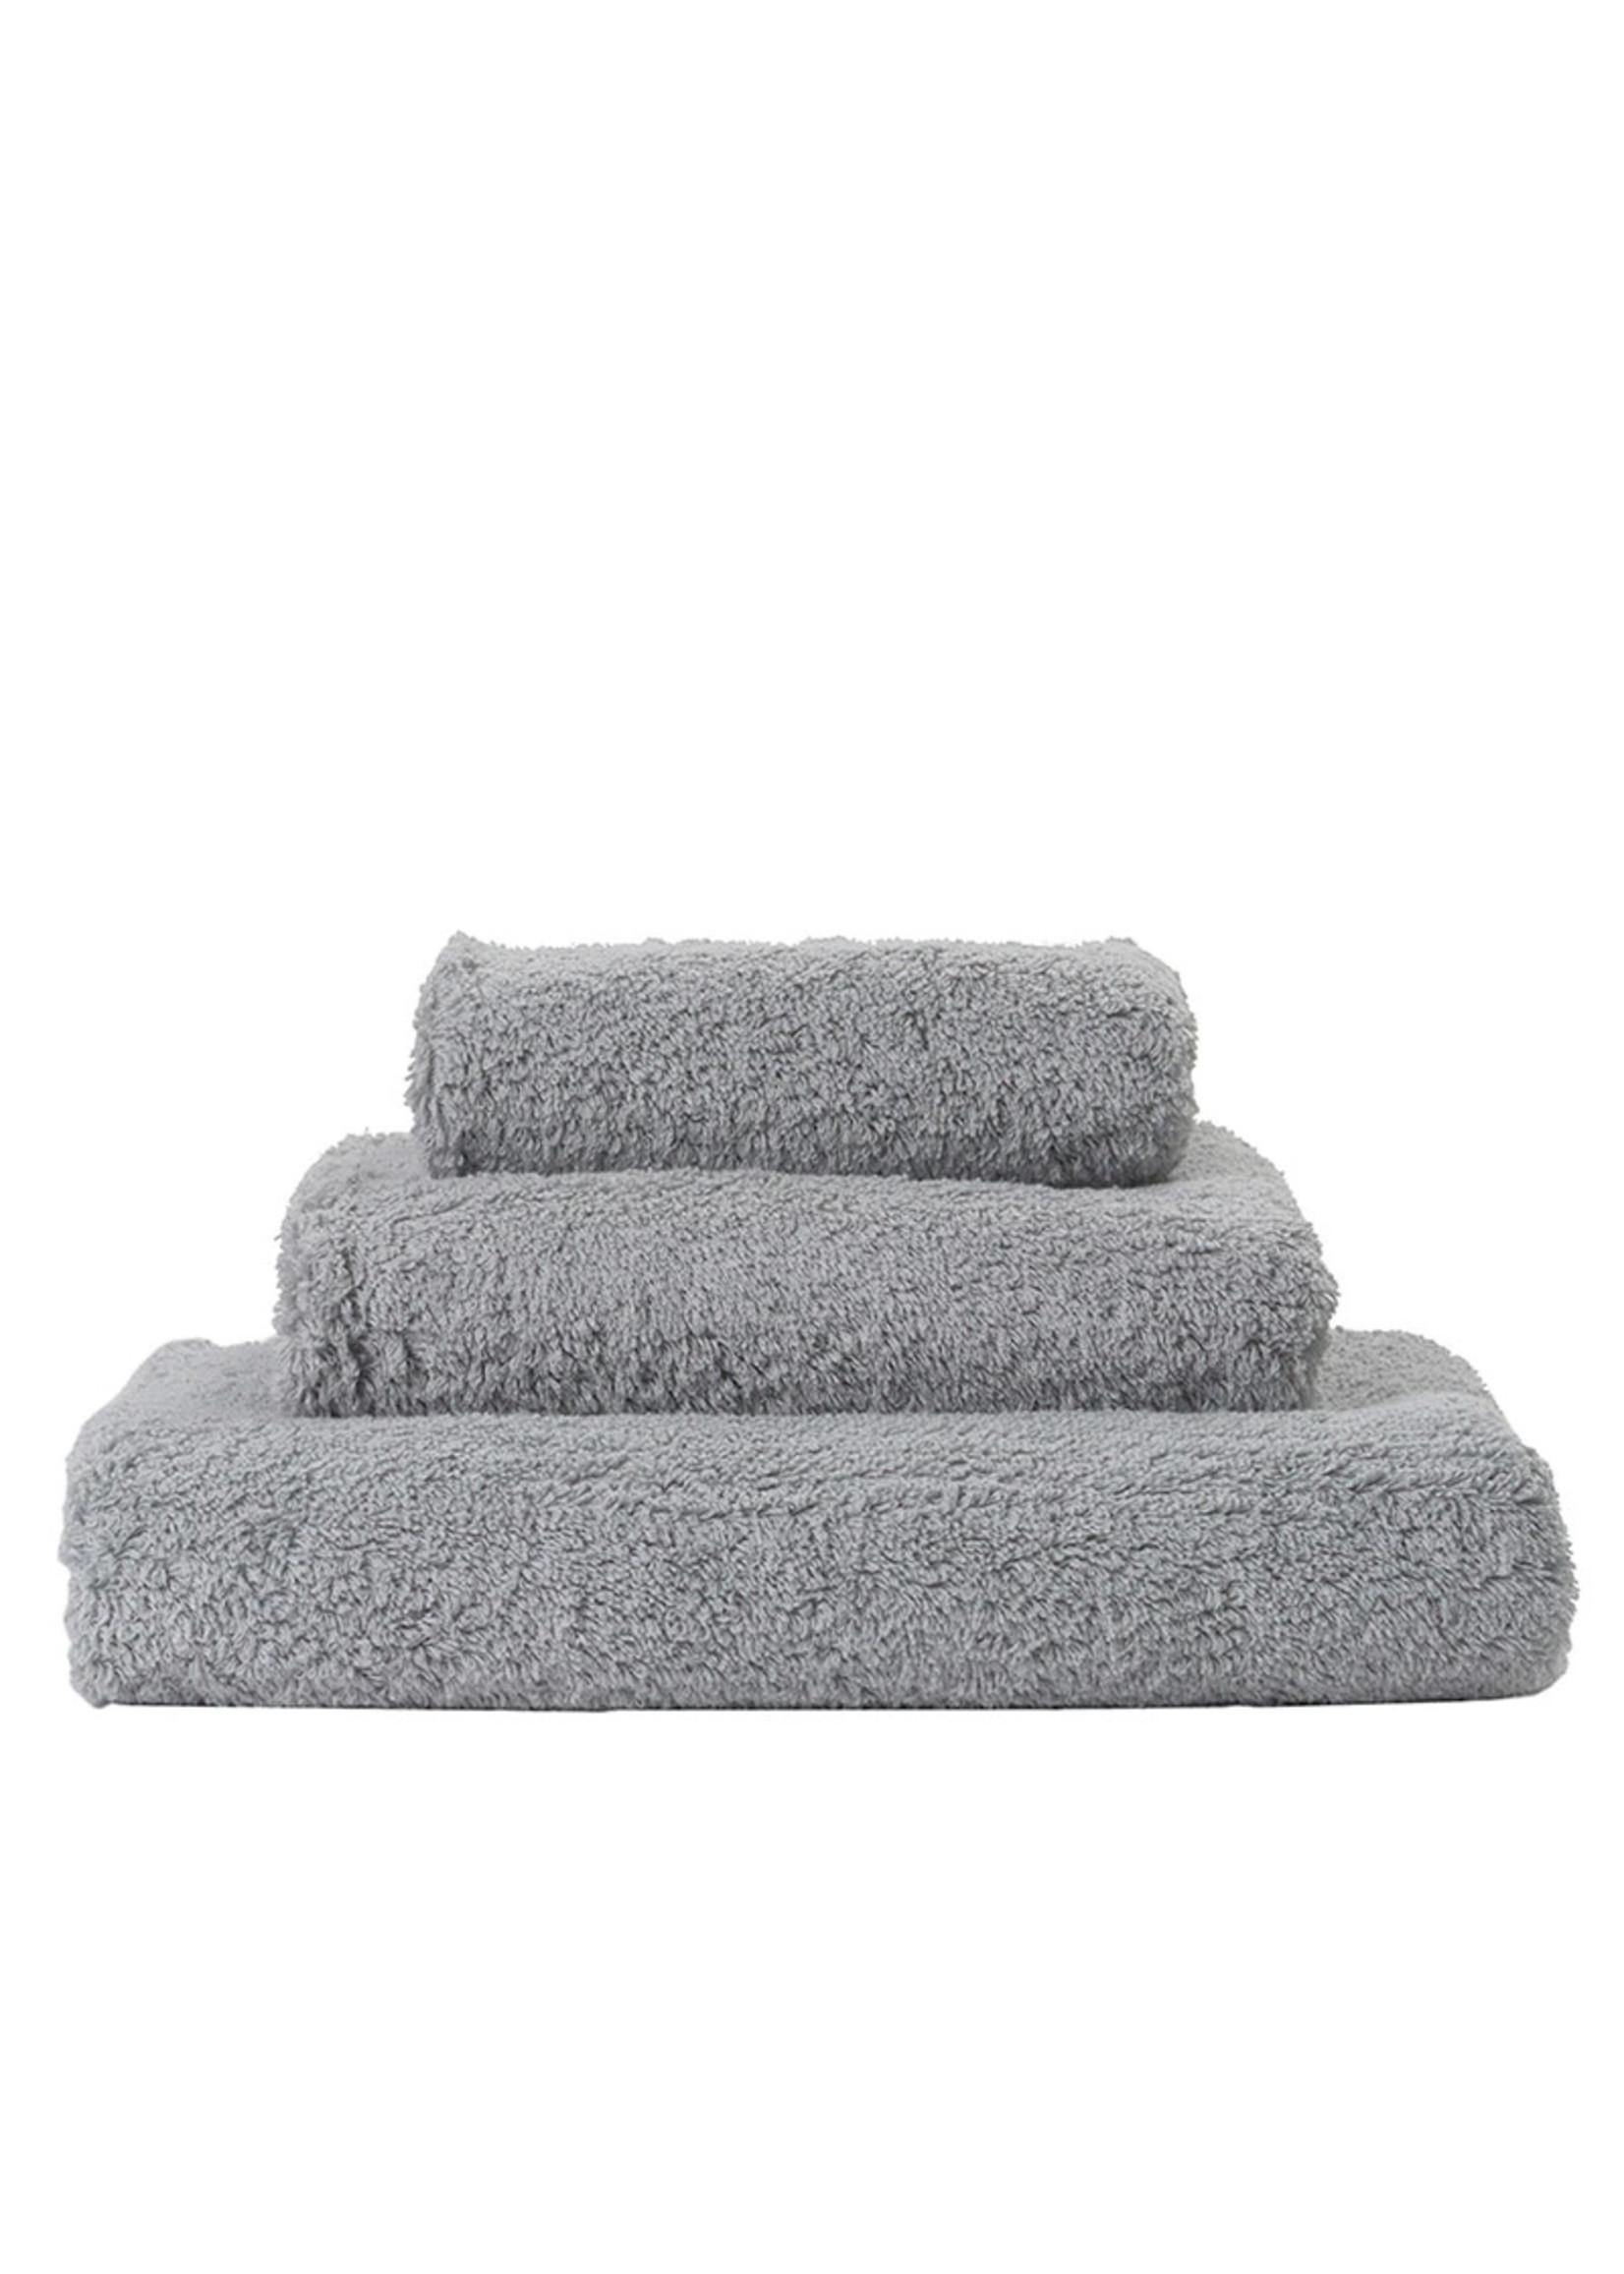 Abyss & Habidecor Super Pile Platinum Towels